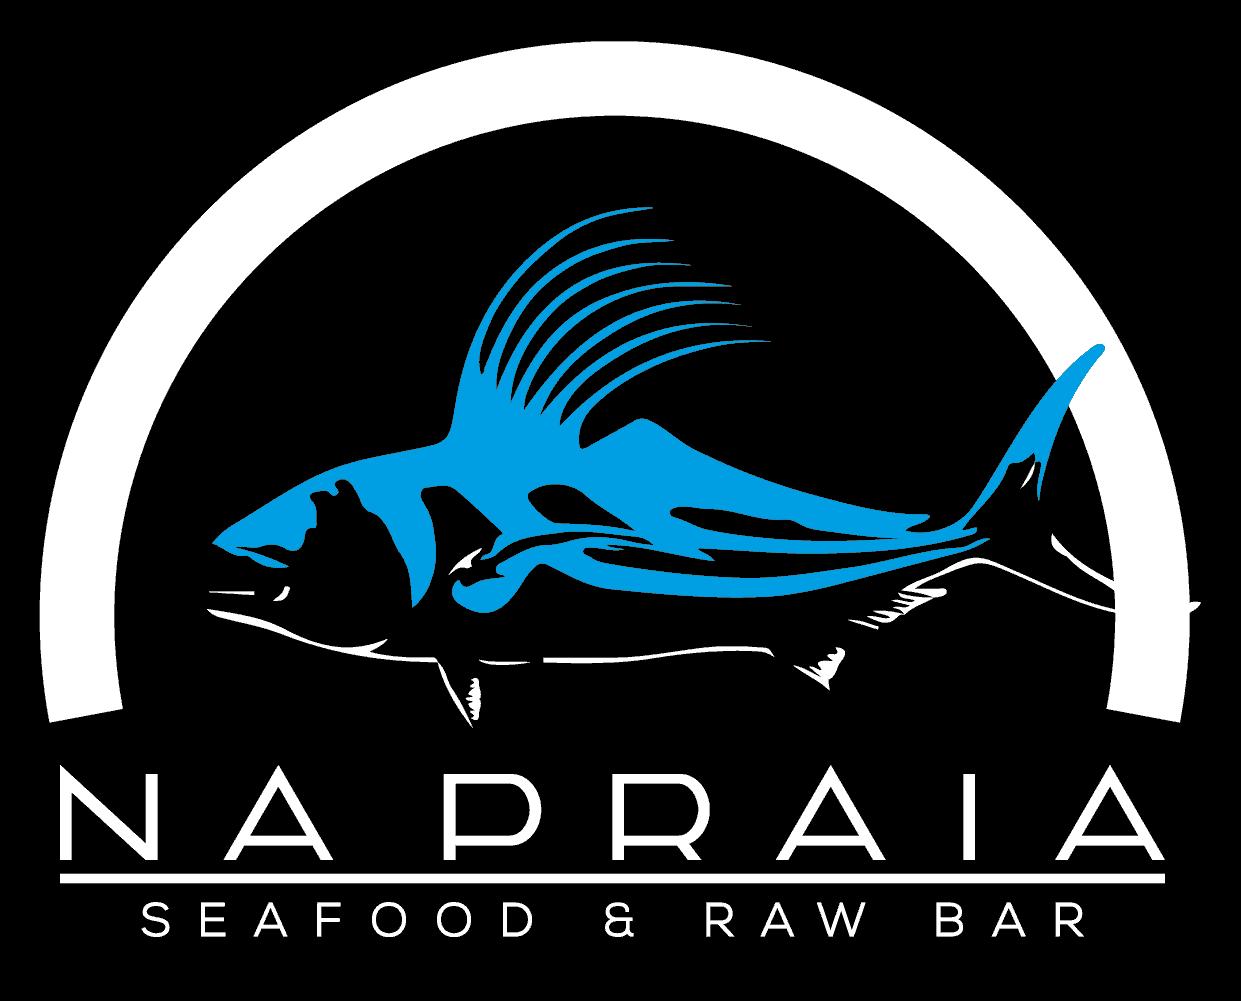 Na Praia Seafood & Raw Bar